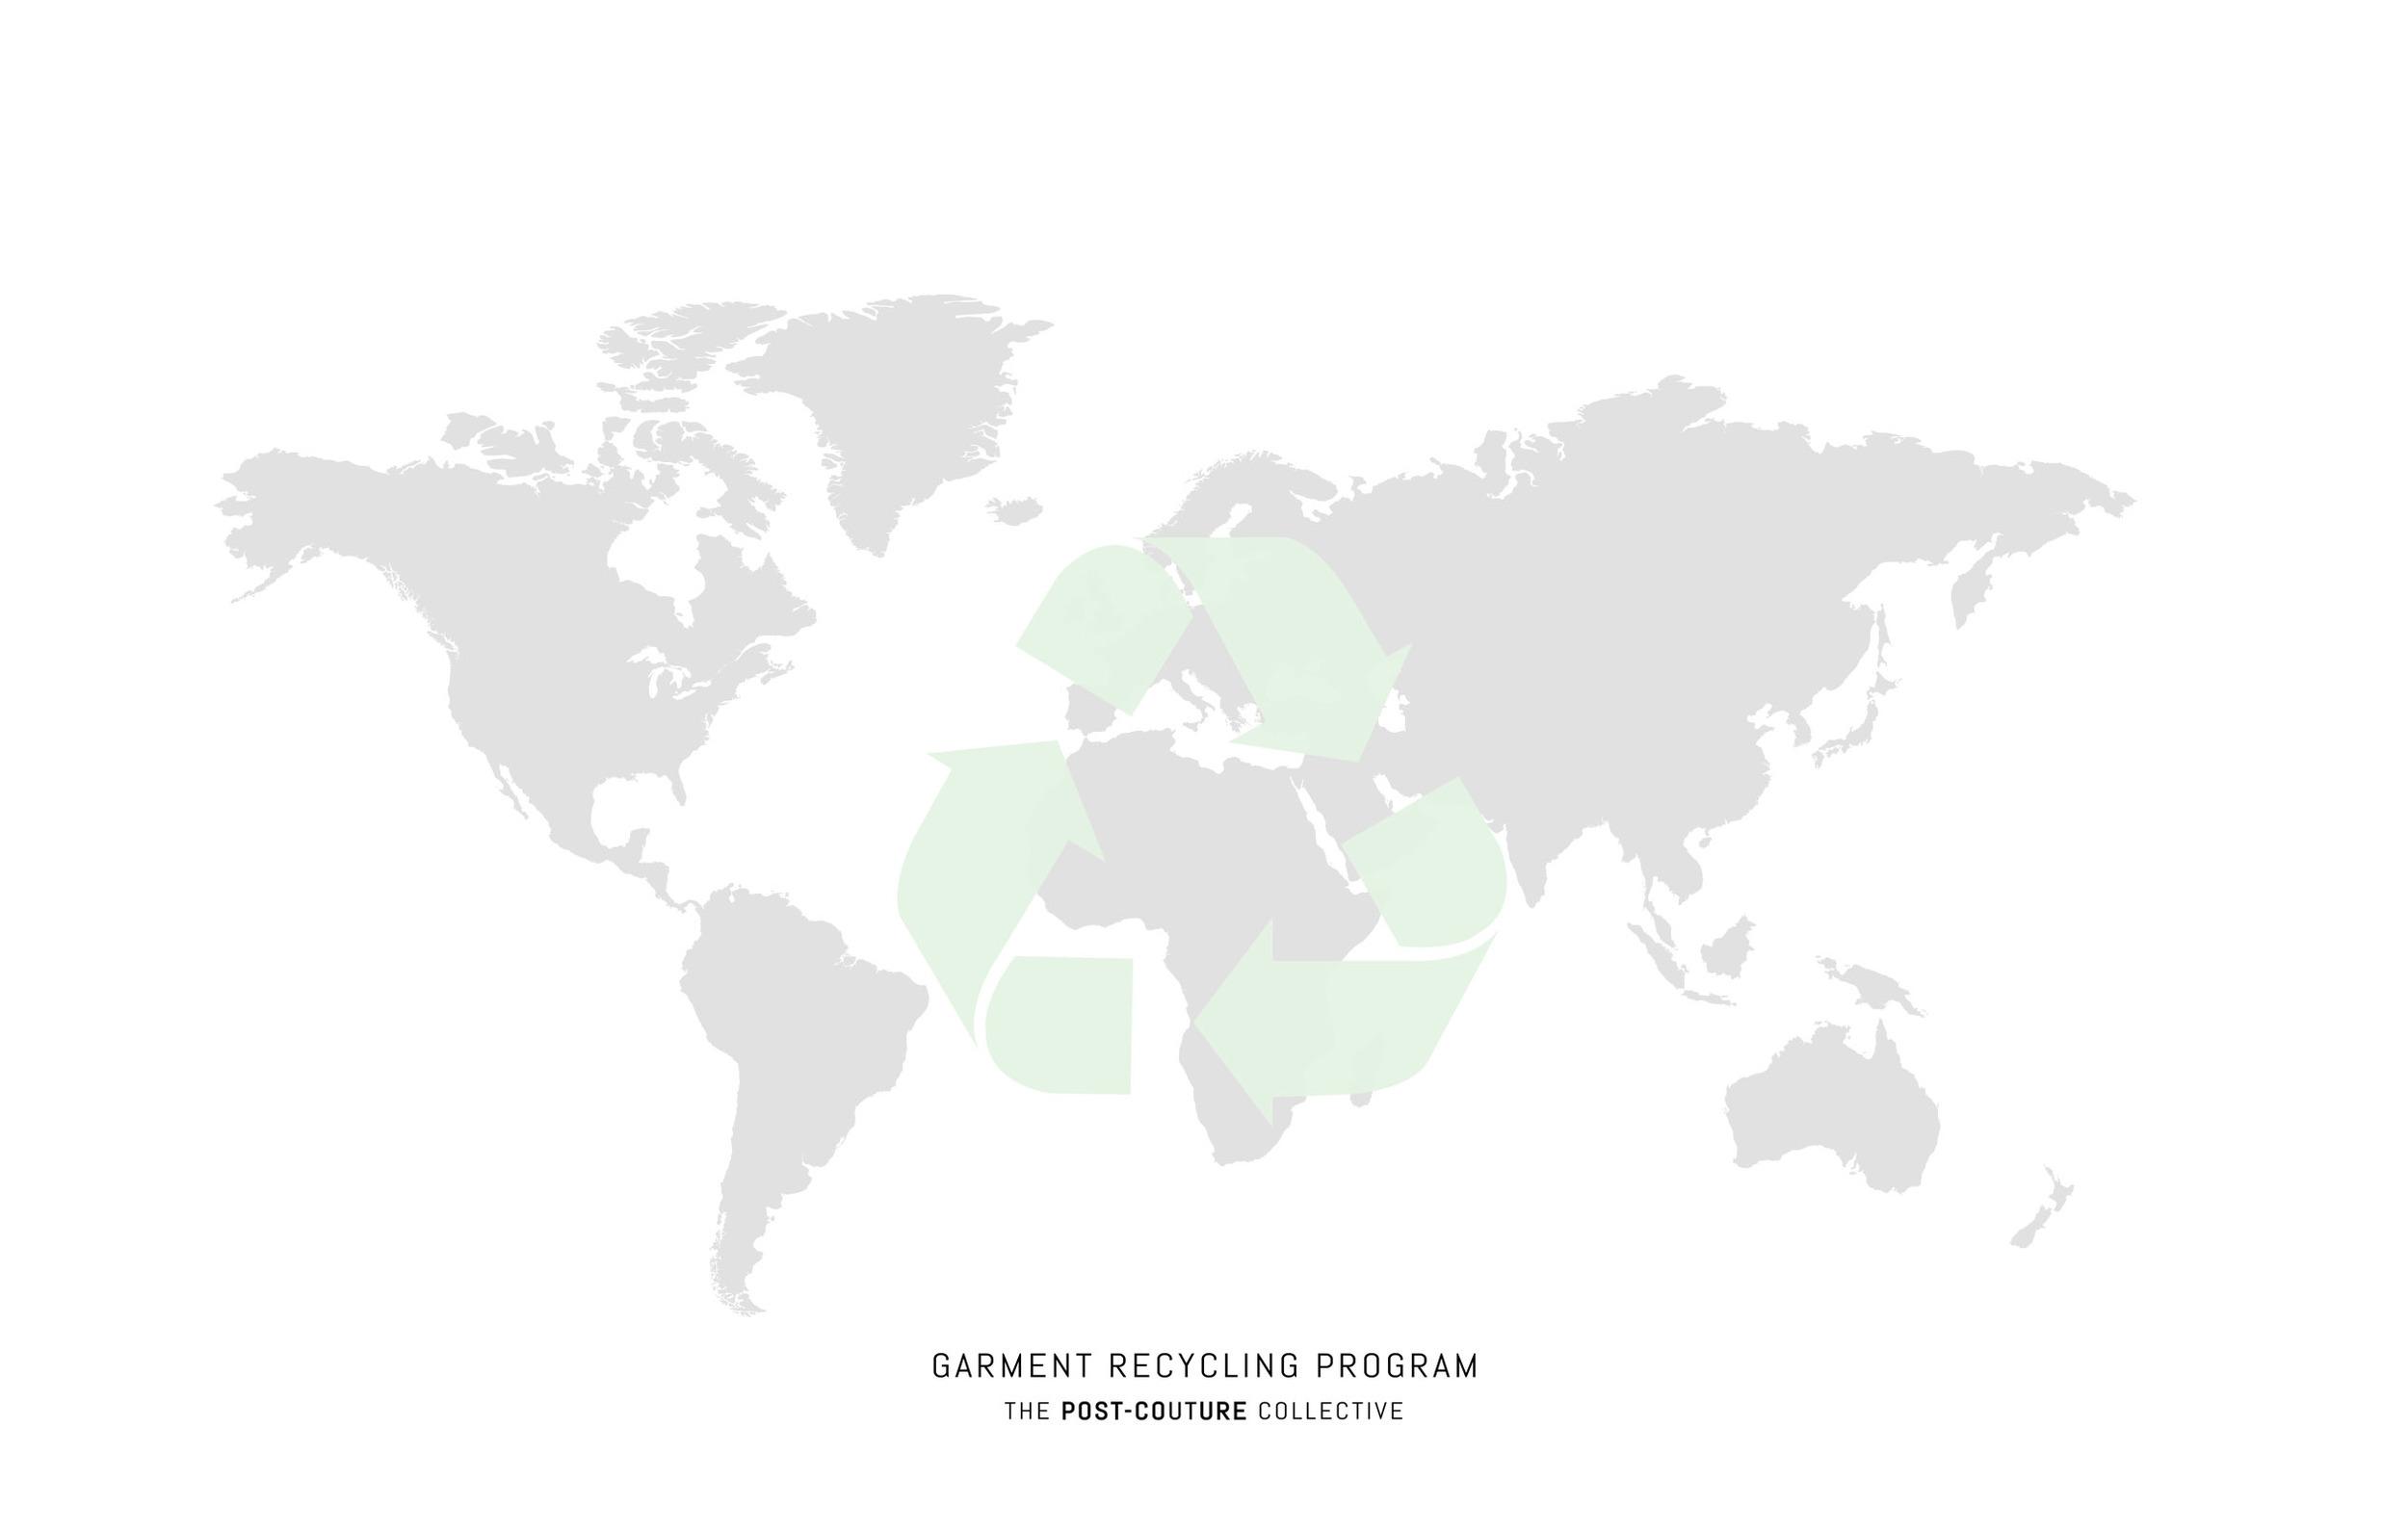 world_recycling.jpg